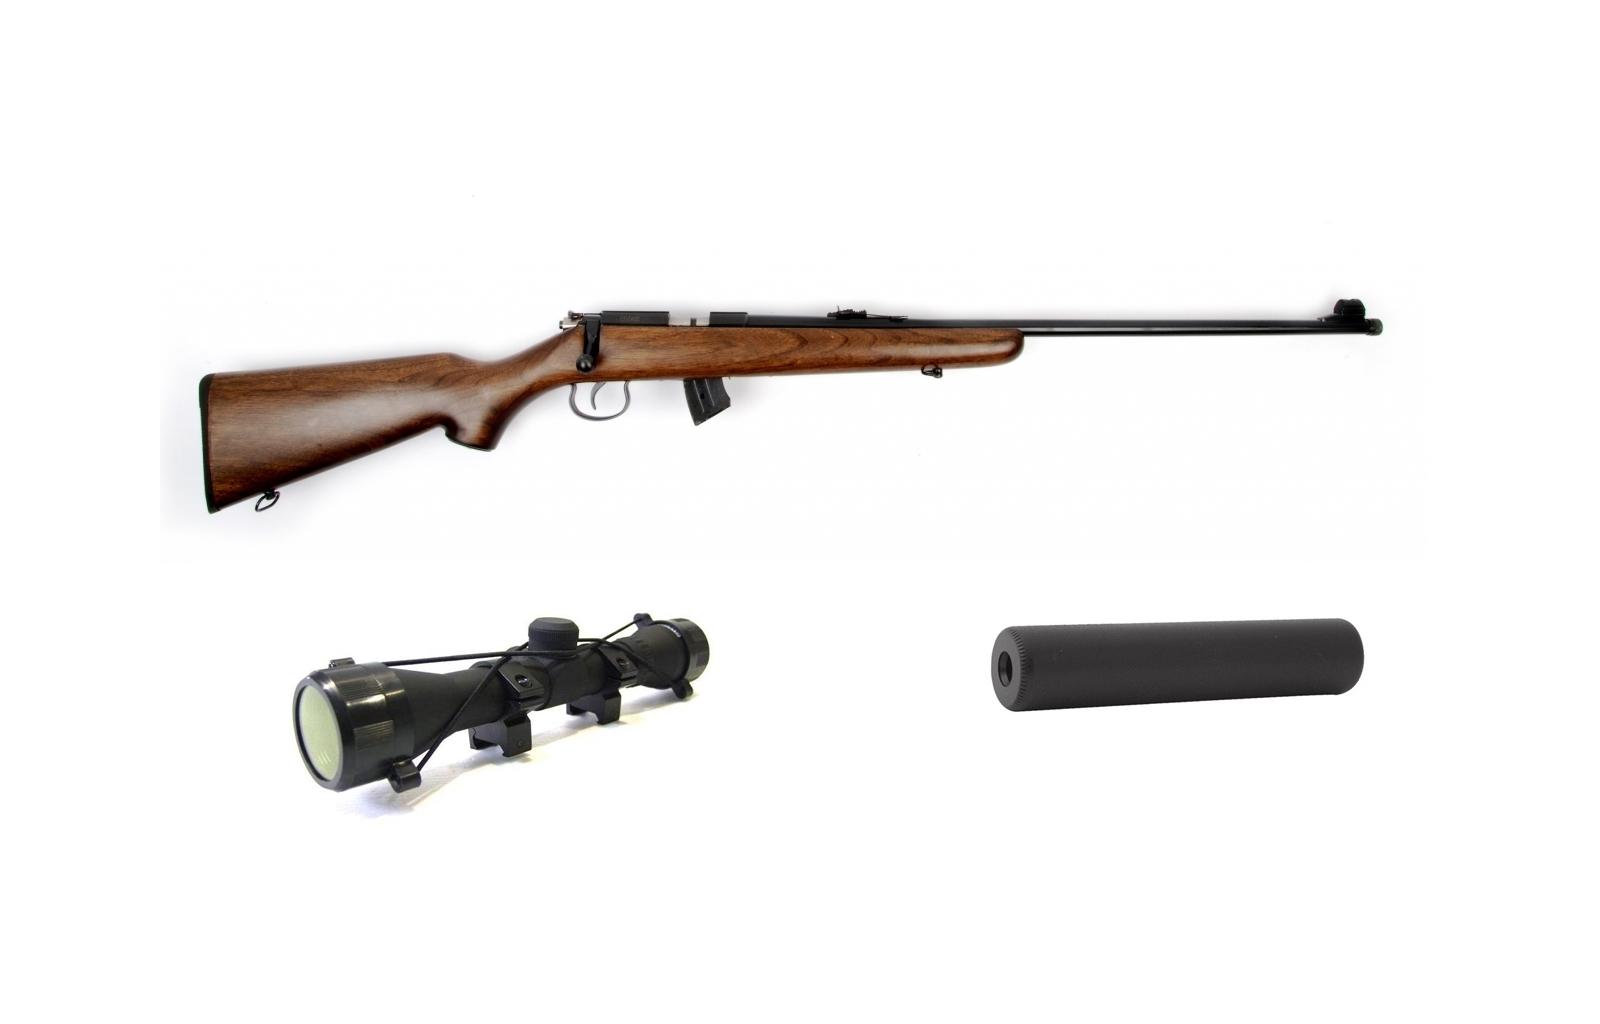 Kit carabine 22LR JW15 Bois Silencieux + Lunette